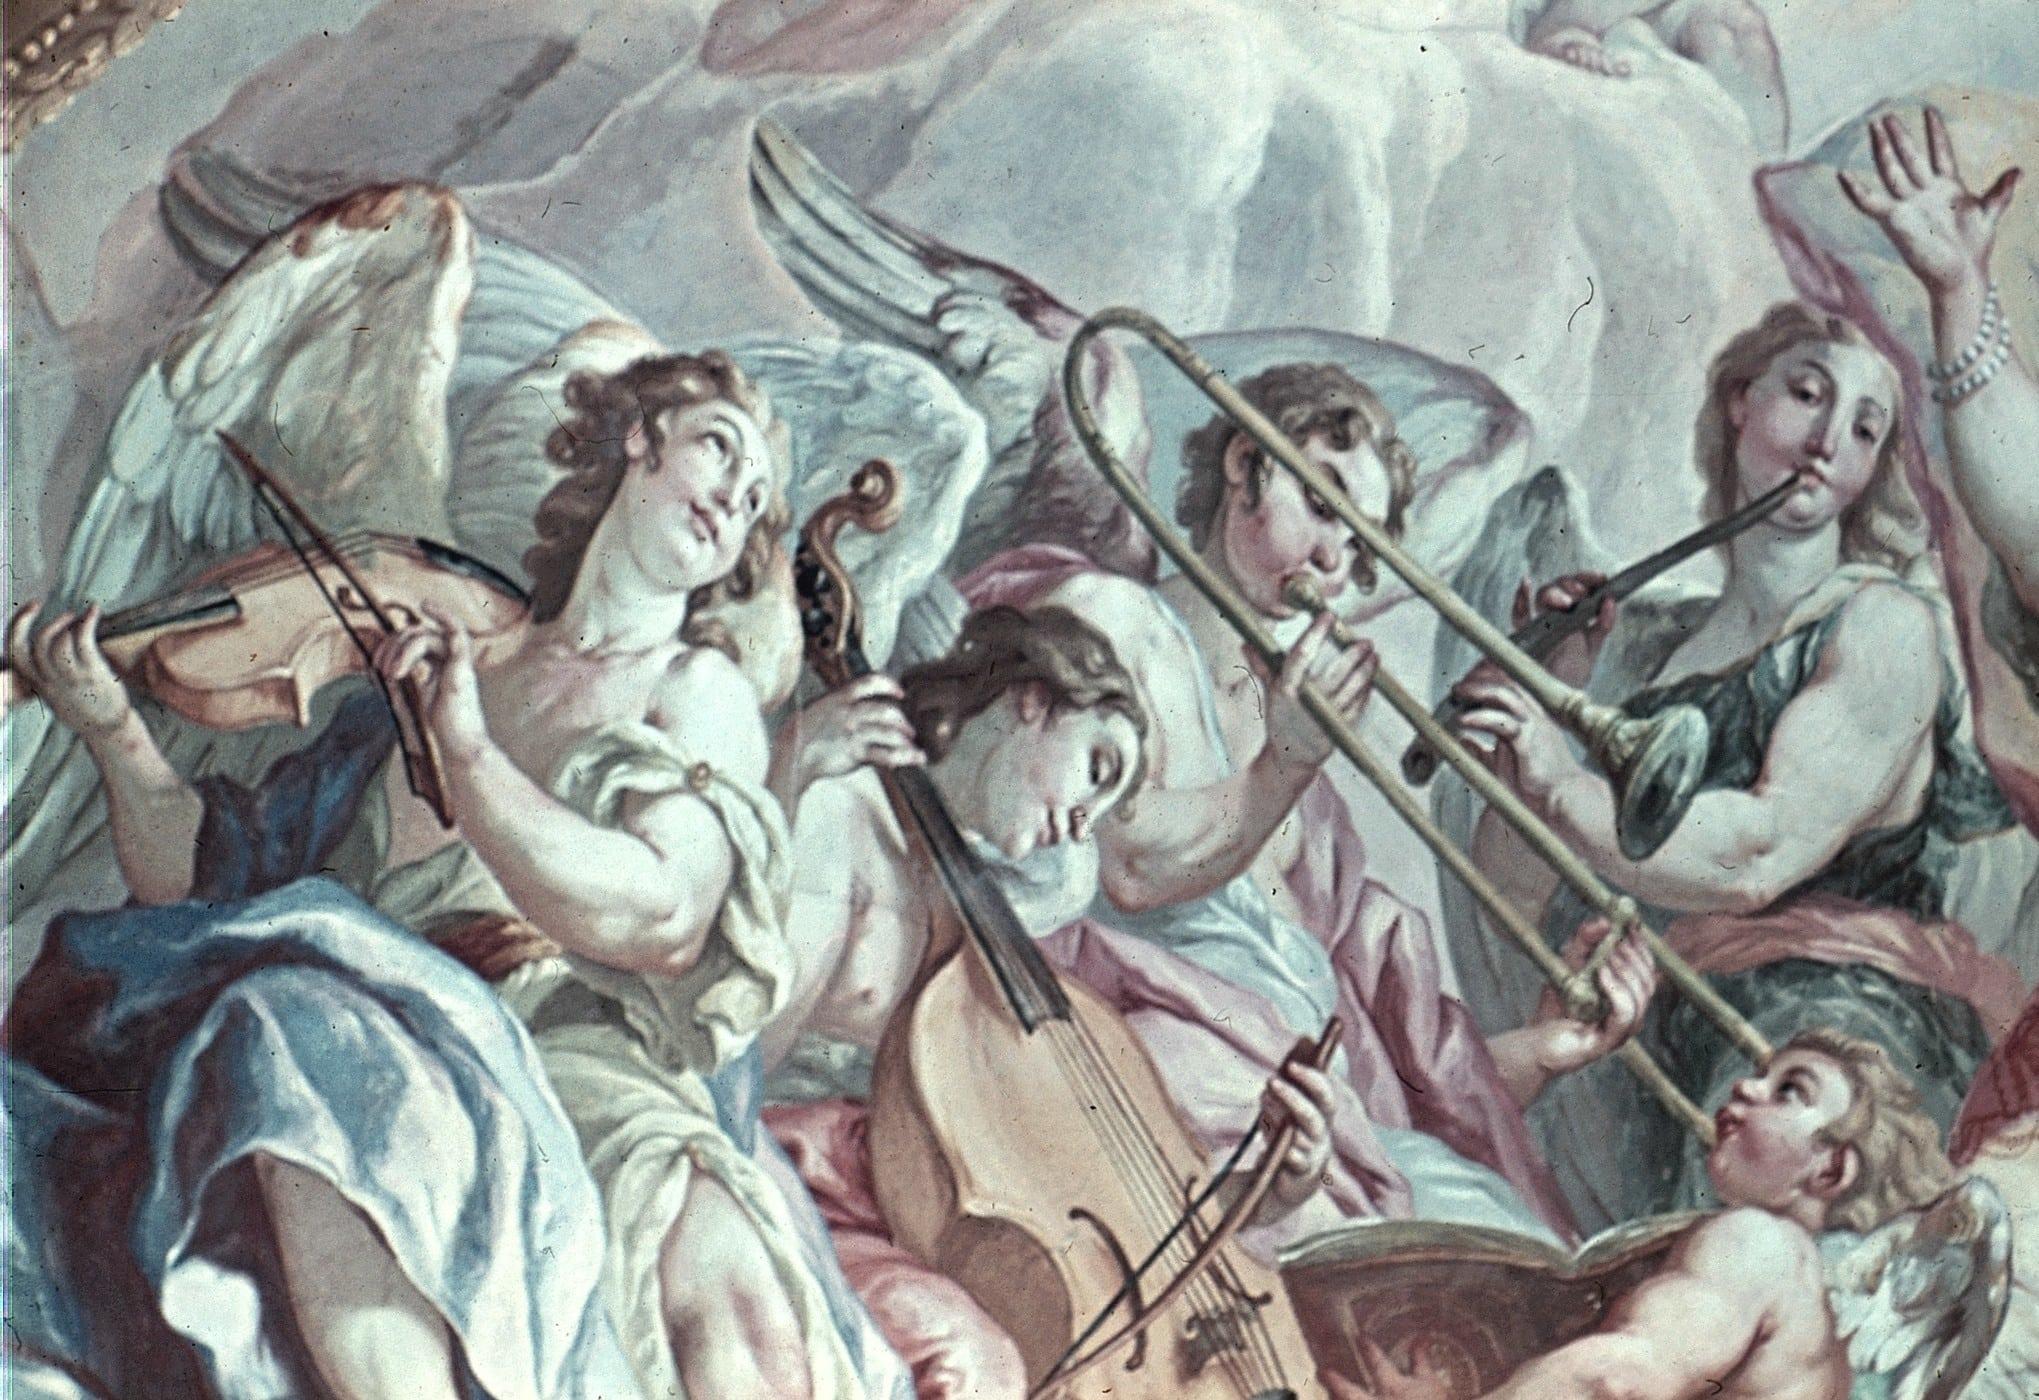 Willem & Frans go classical